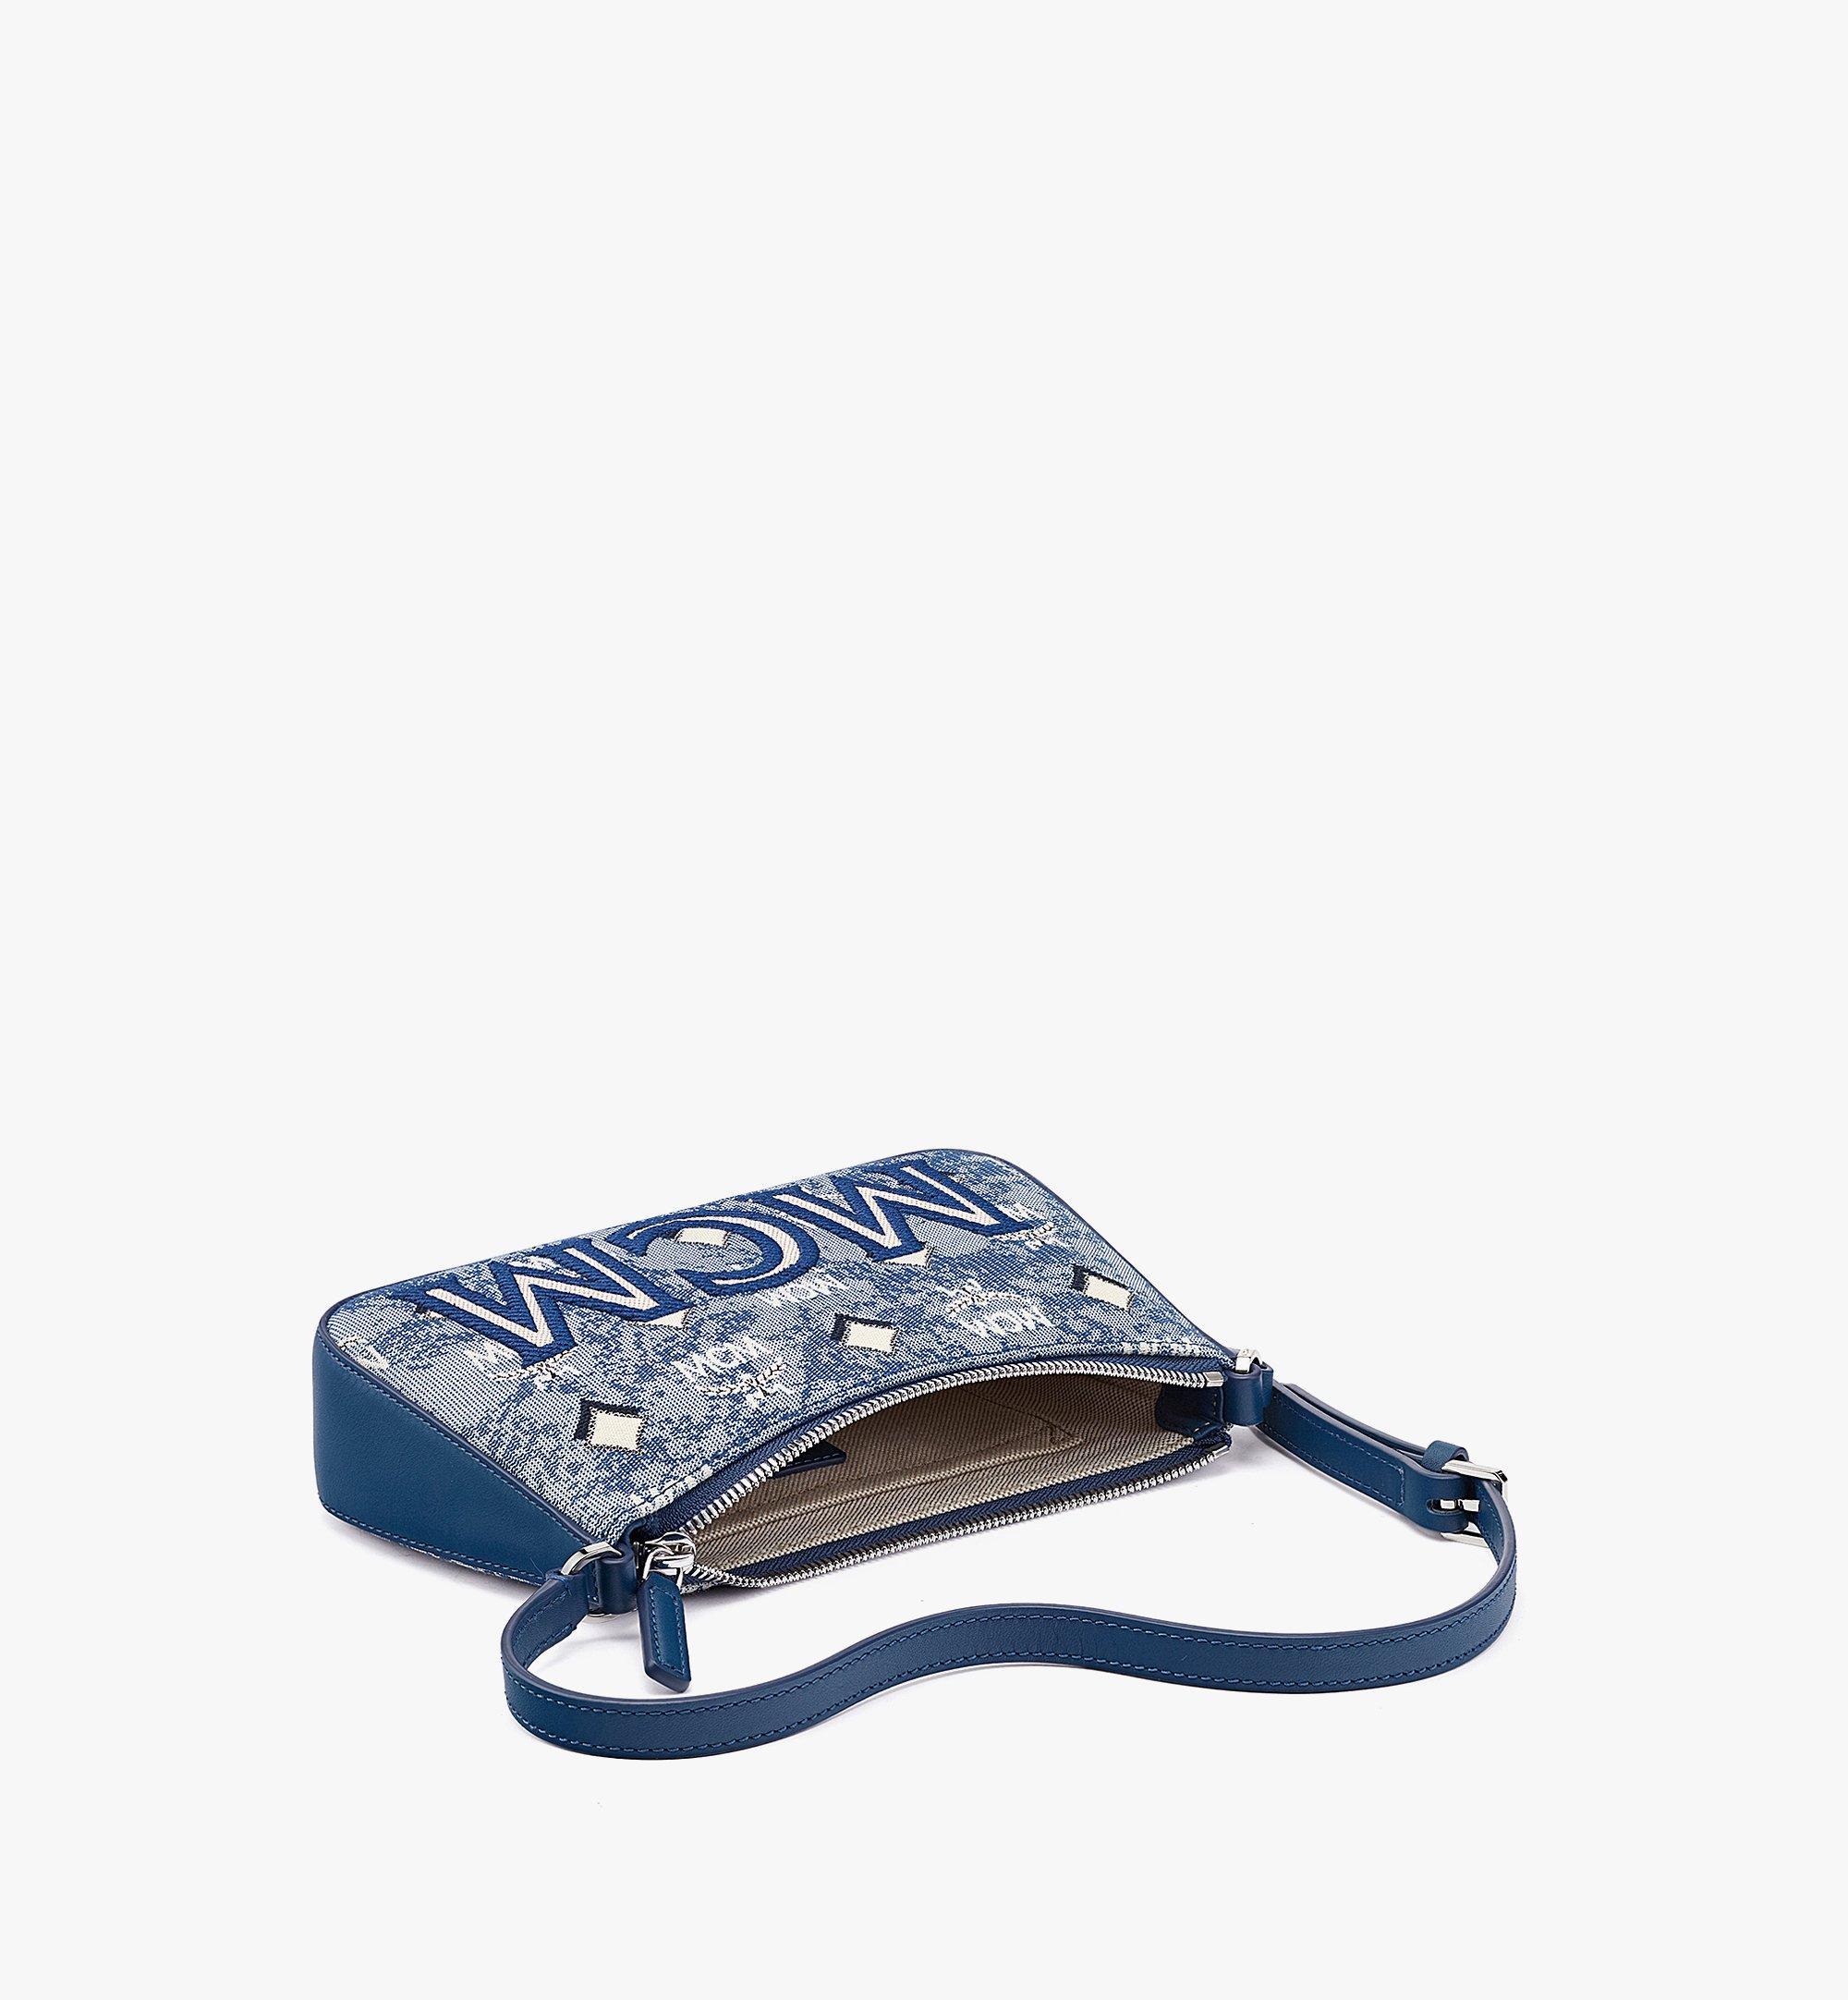 MCM 빈티지 자카드 모노그램 숄더 백 Blue MWSBATQ01LU001 다른 각도 보기 2